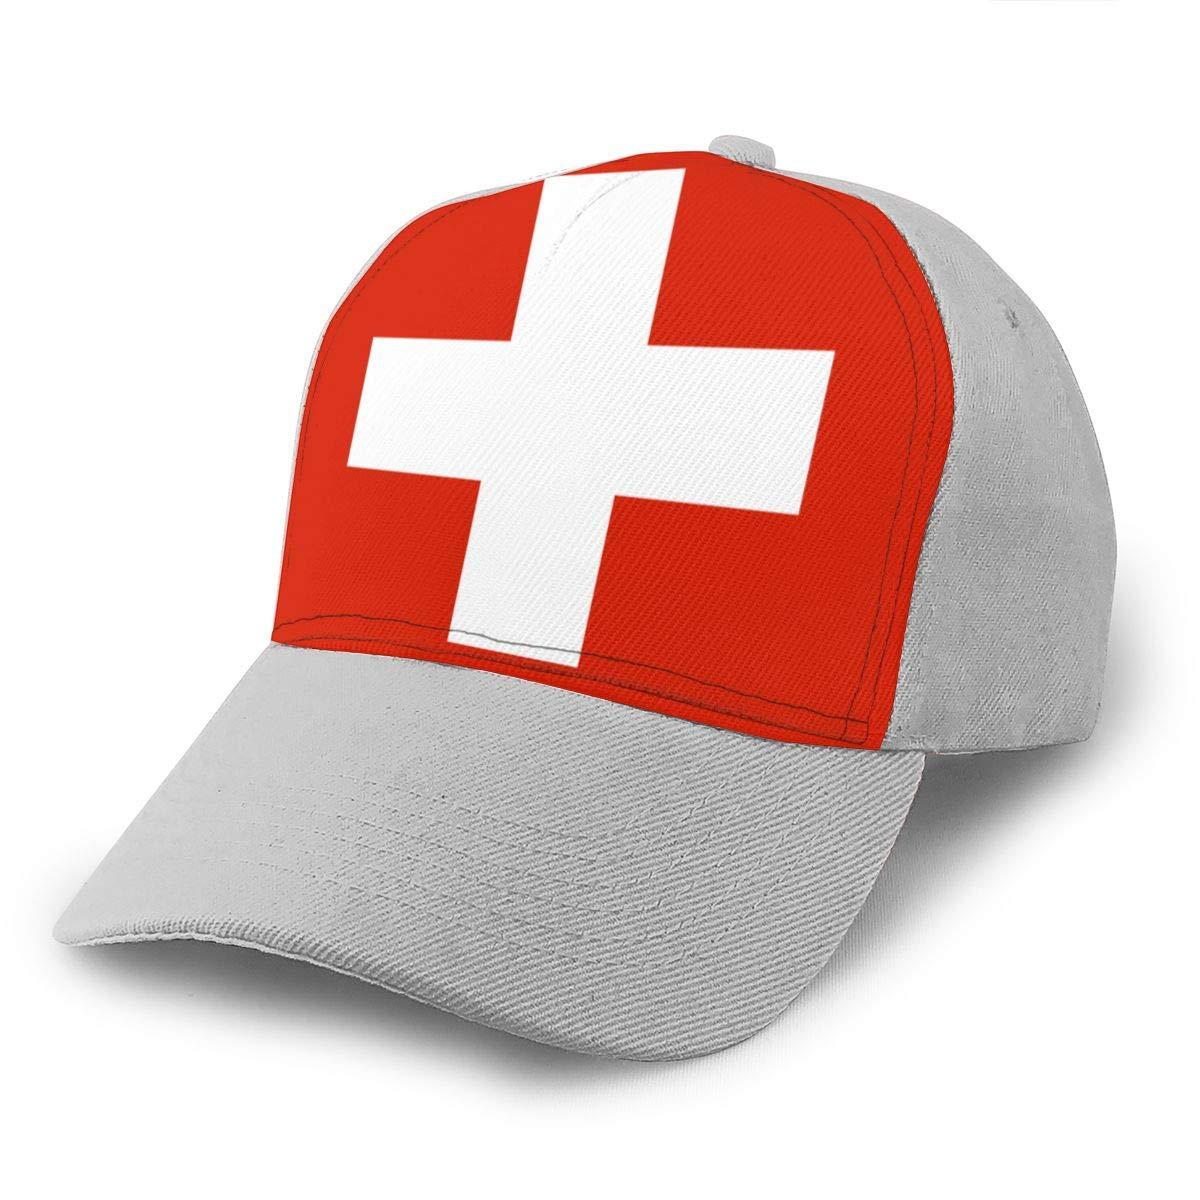 Y94OIW@MAO Switzerland Flag Peaked Cap for Men and Women Cotton Snapback Cap